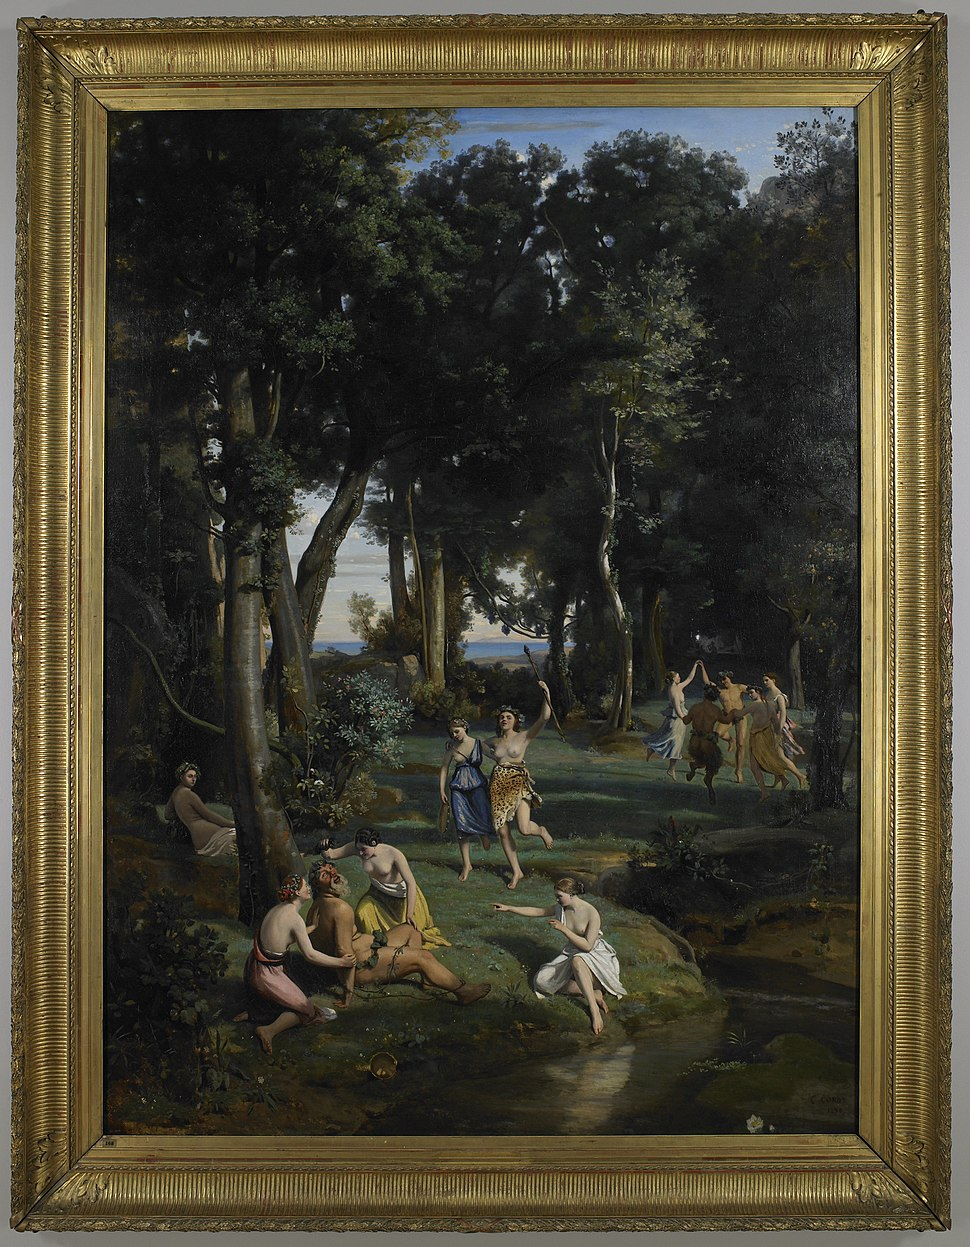 Jean-Baptiste-Camille Corot - Silenus - 73.42.2 - Minneapolis Institute of Arts